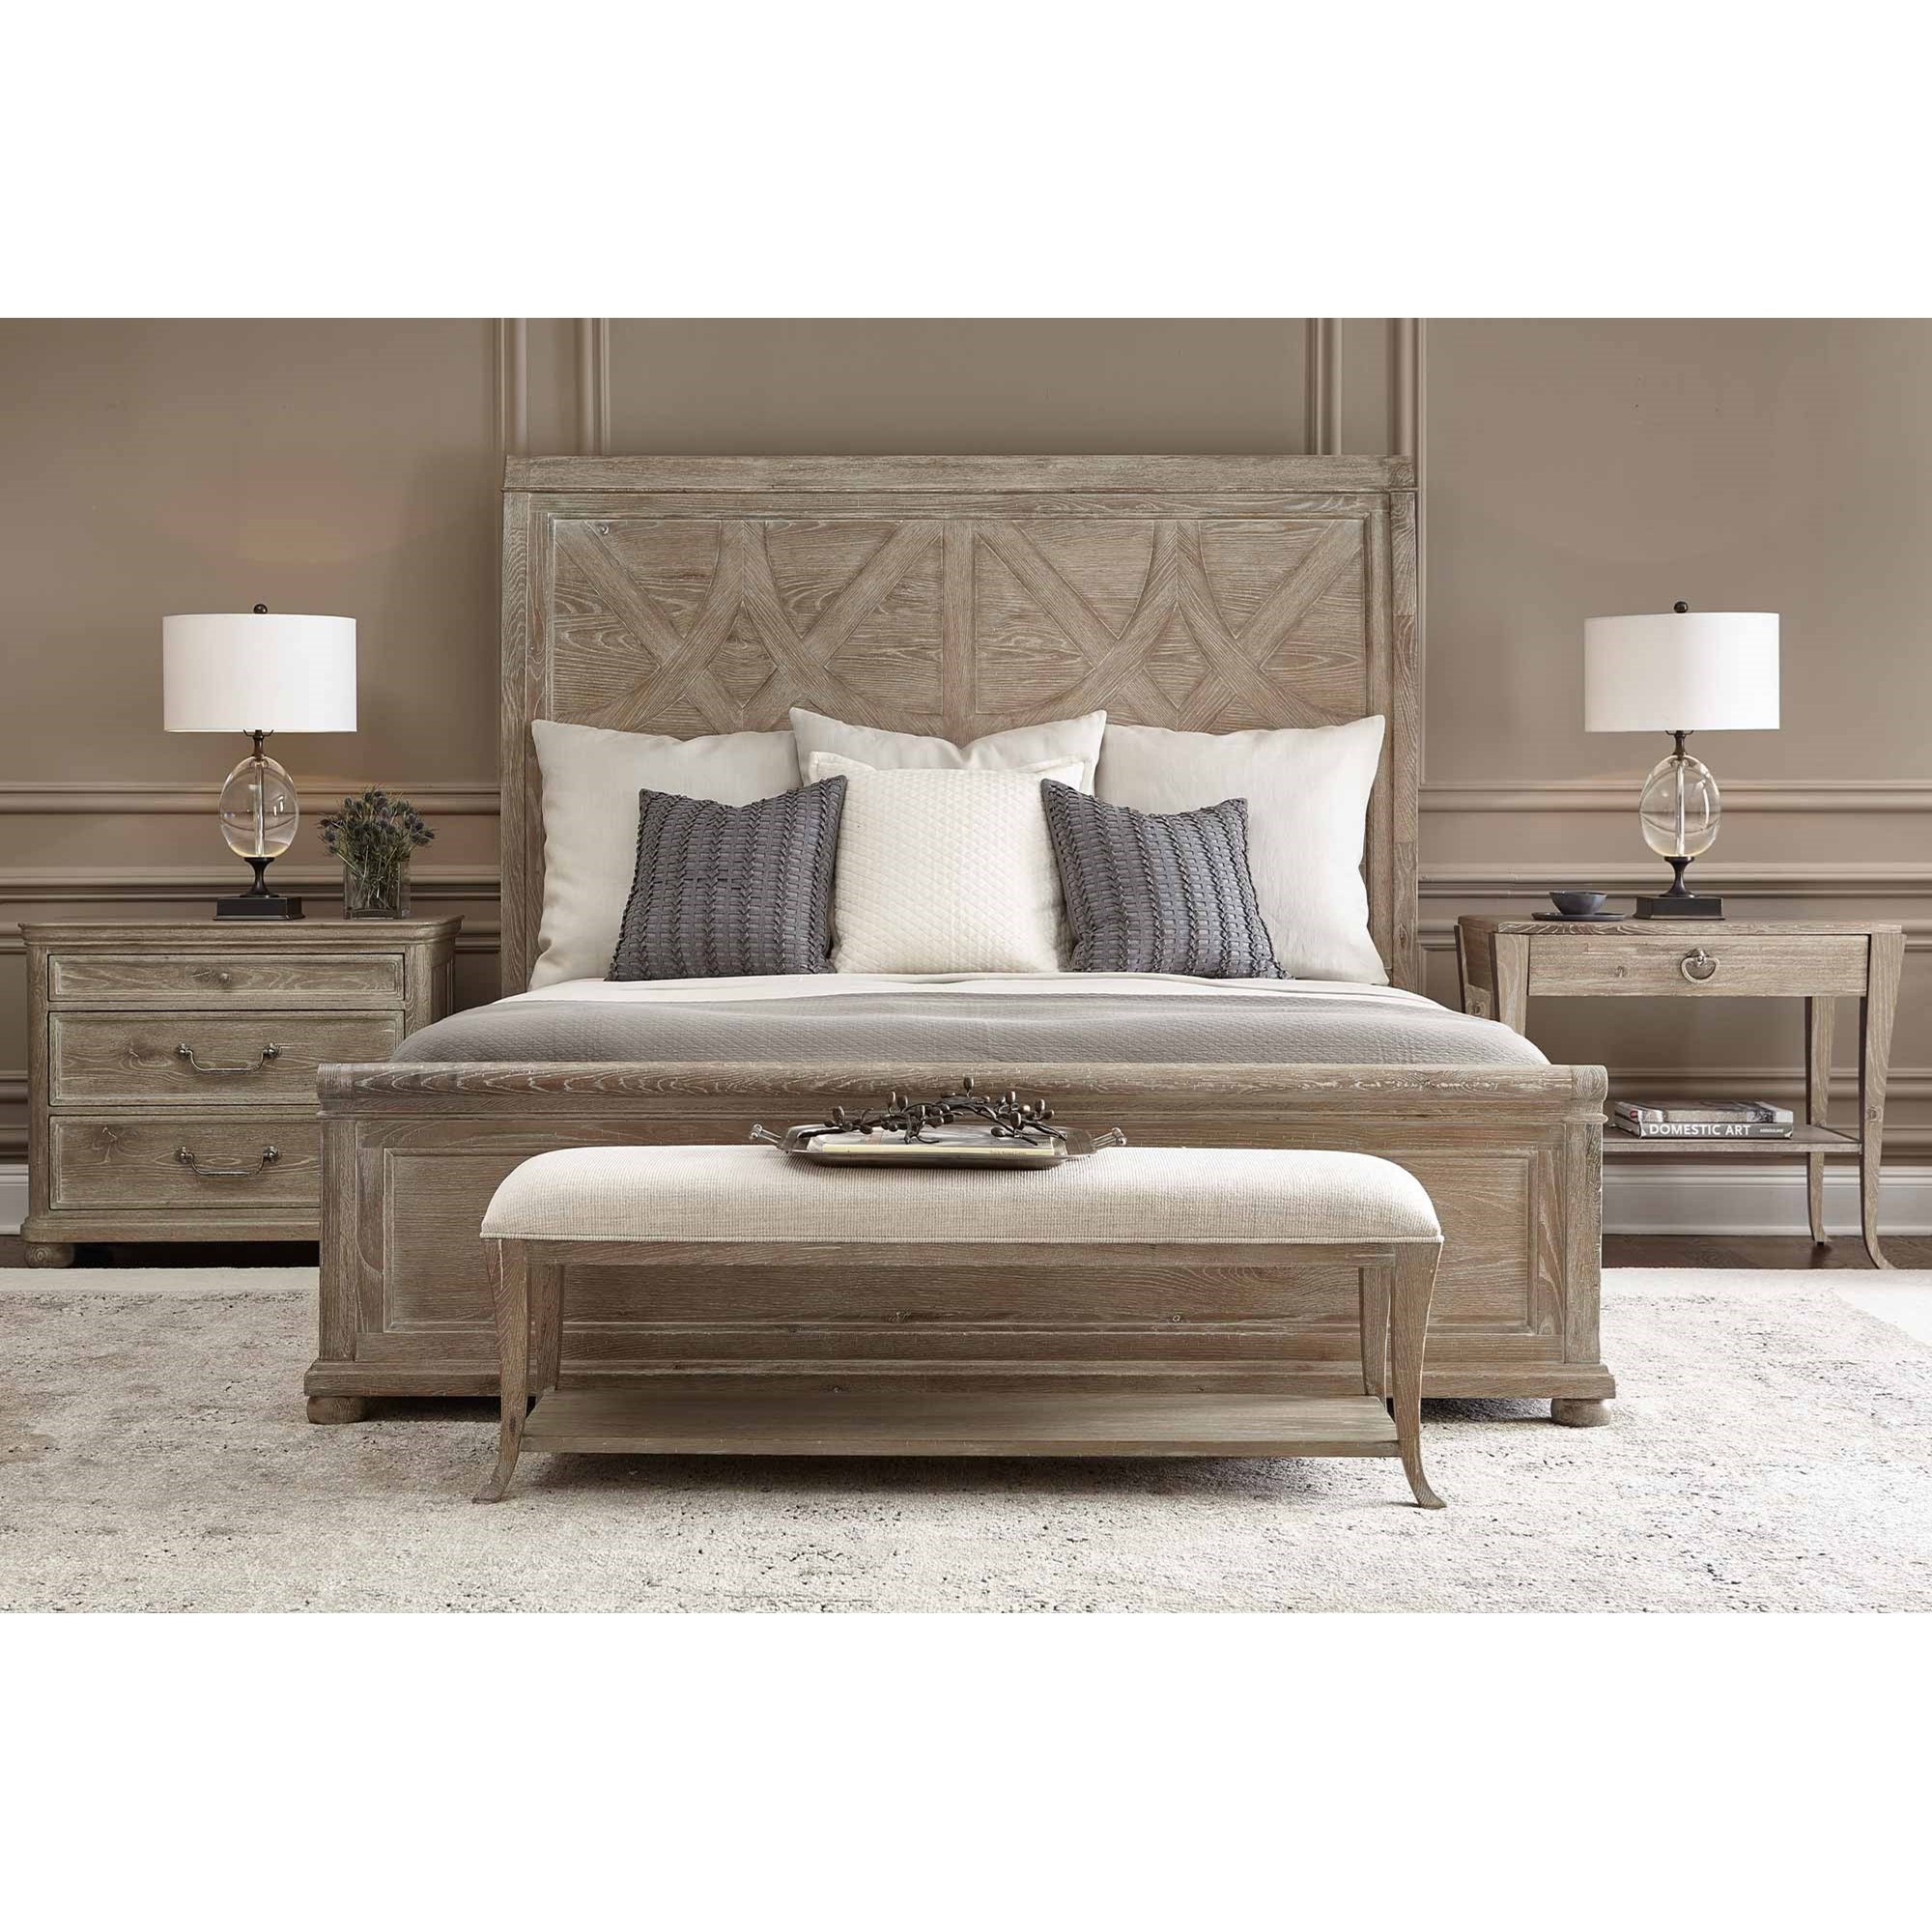 Rustic Patina California King Bedroom Group